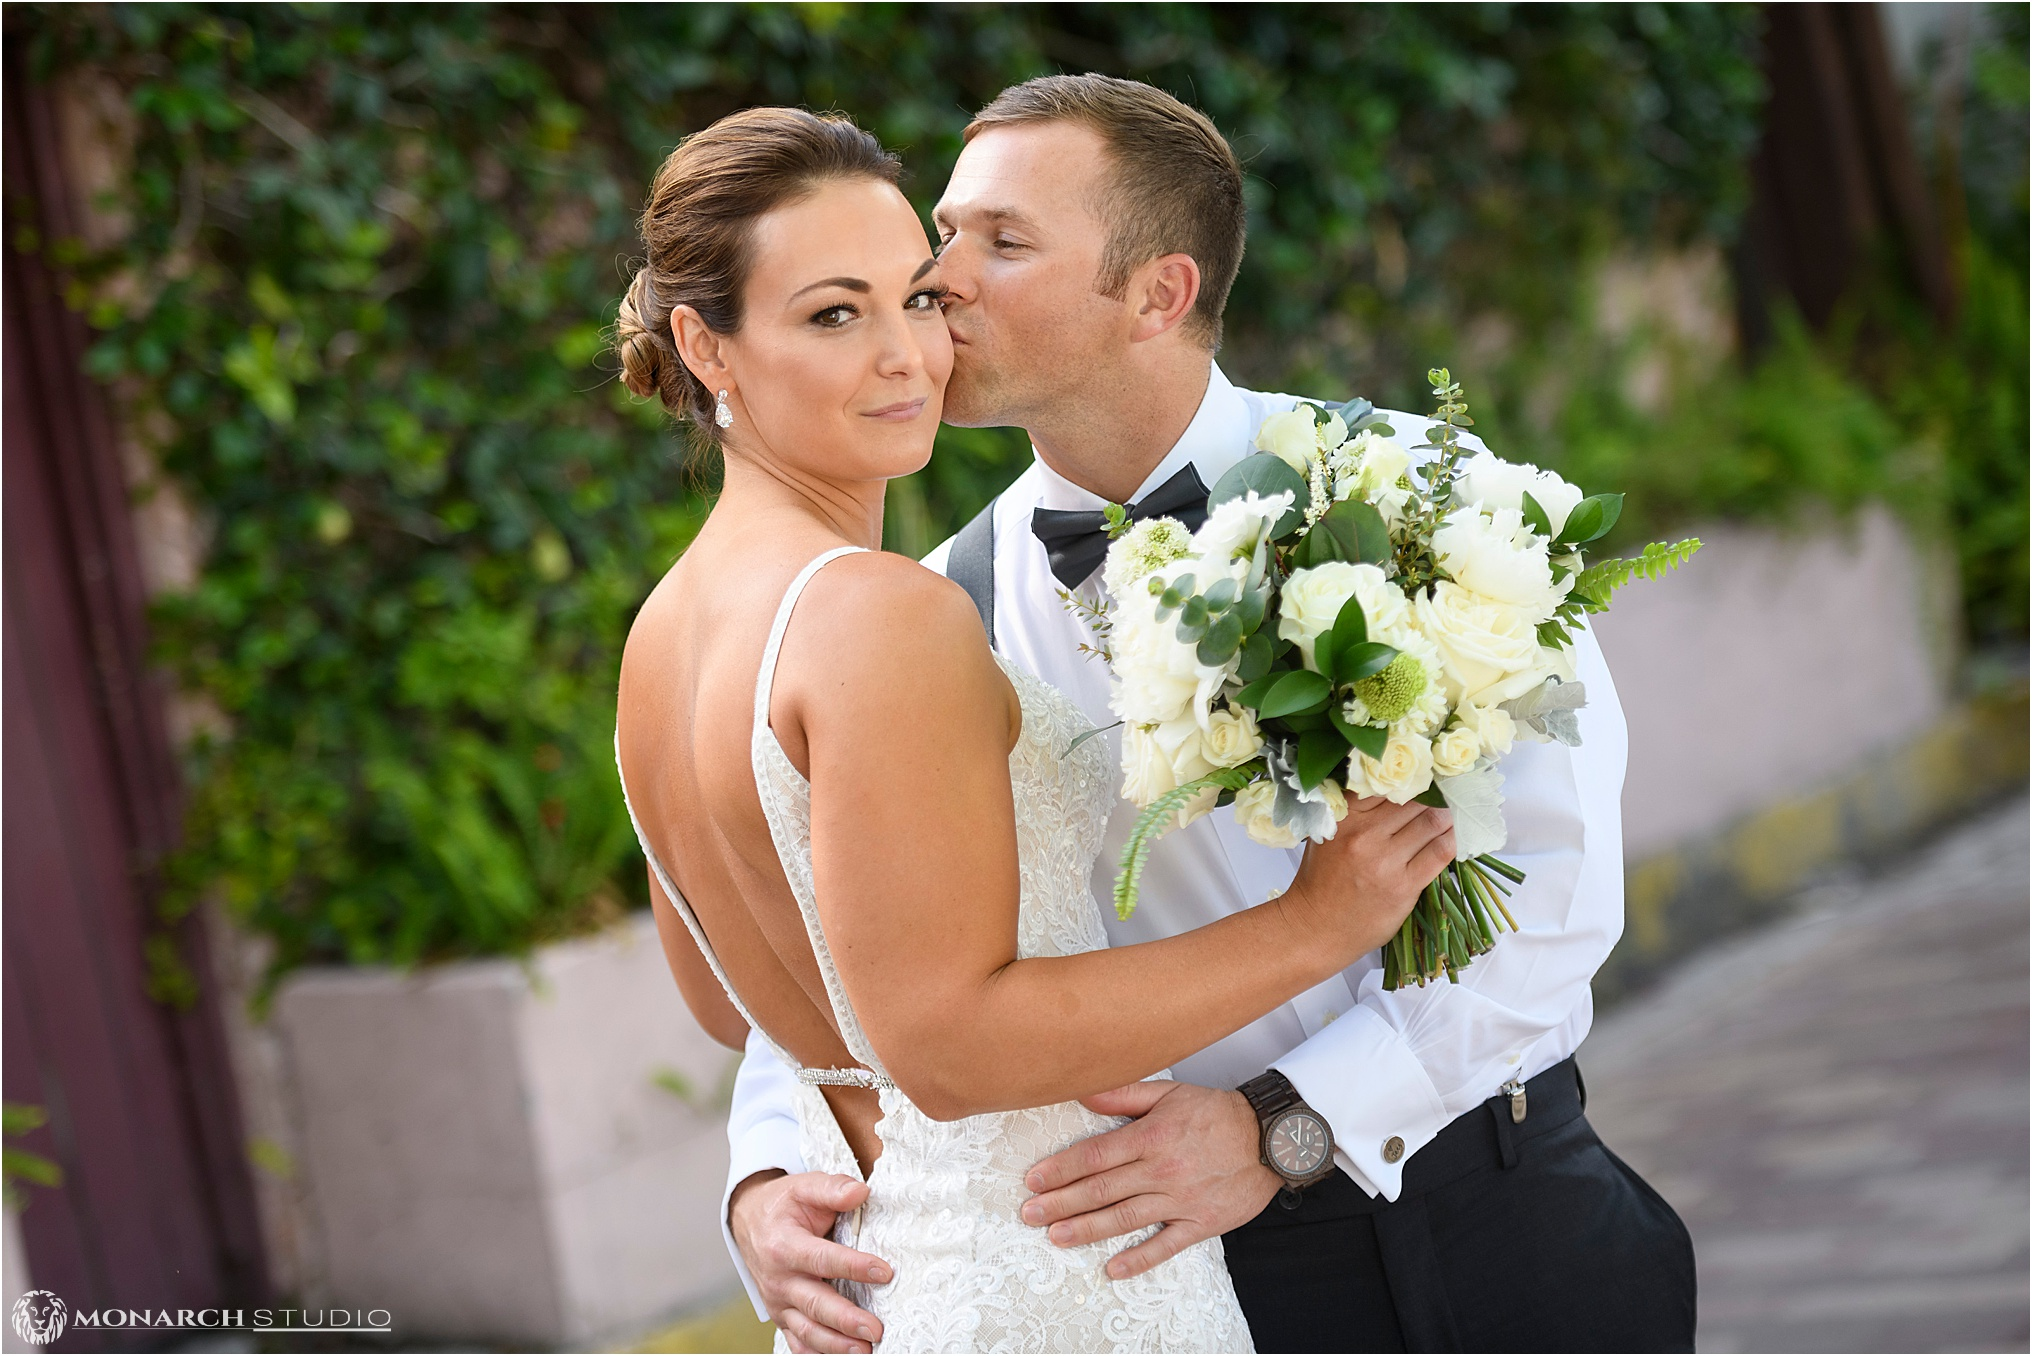 044-whiteroom-wedding-photographer-2019-05-22_0026.jpg